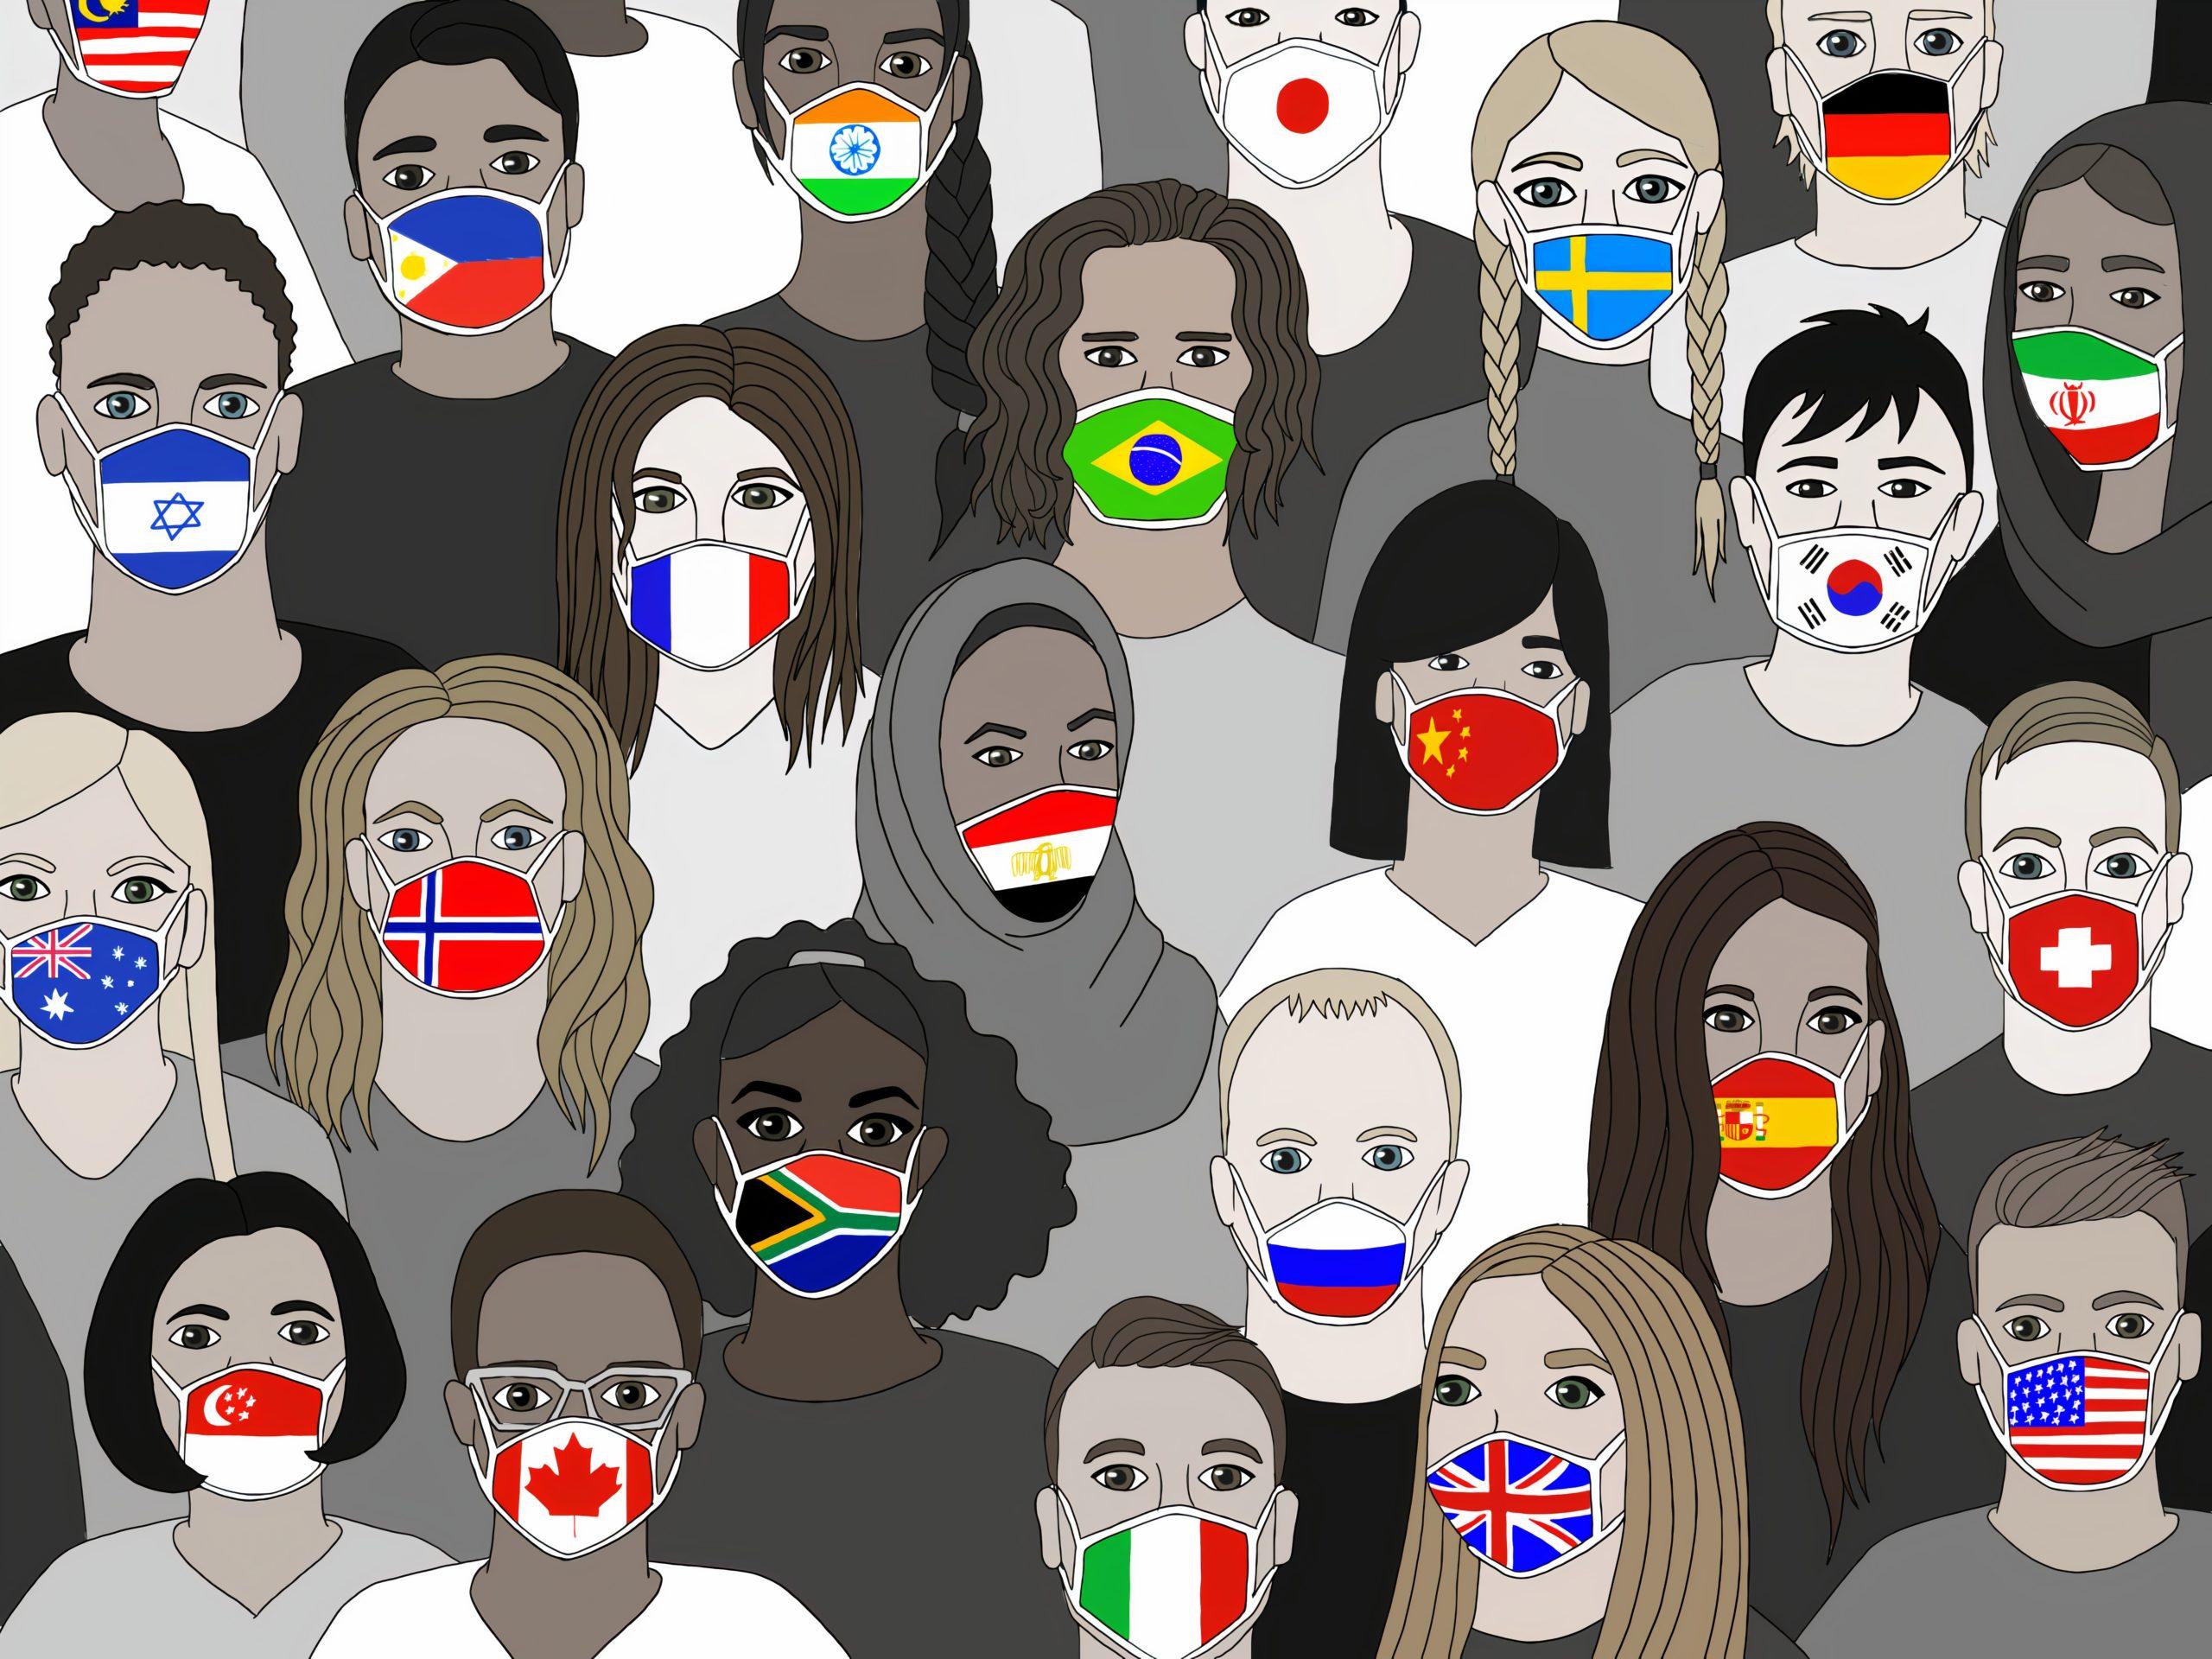 united-nations-covid-19-response-5hp3iqwZXD8-unsplash